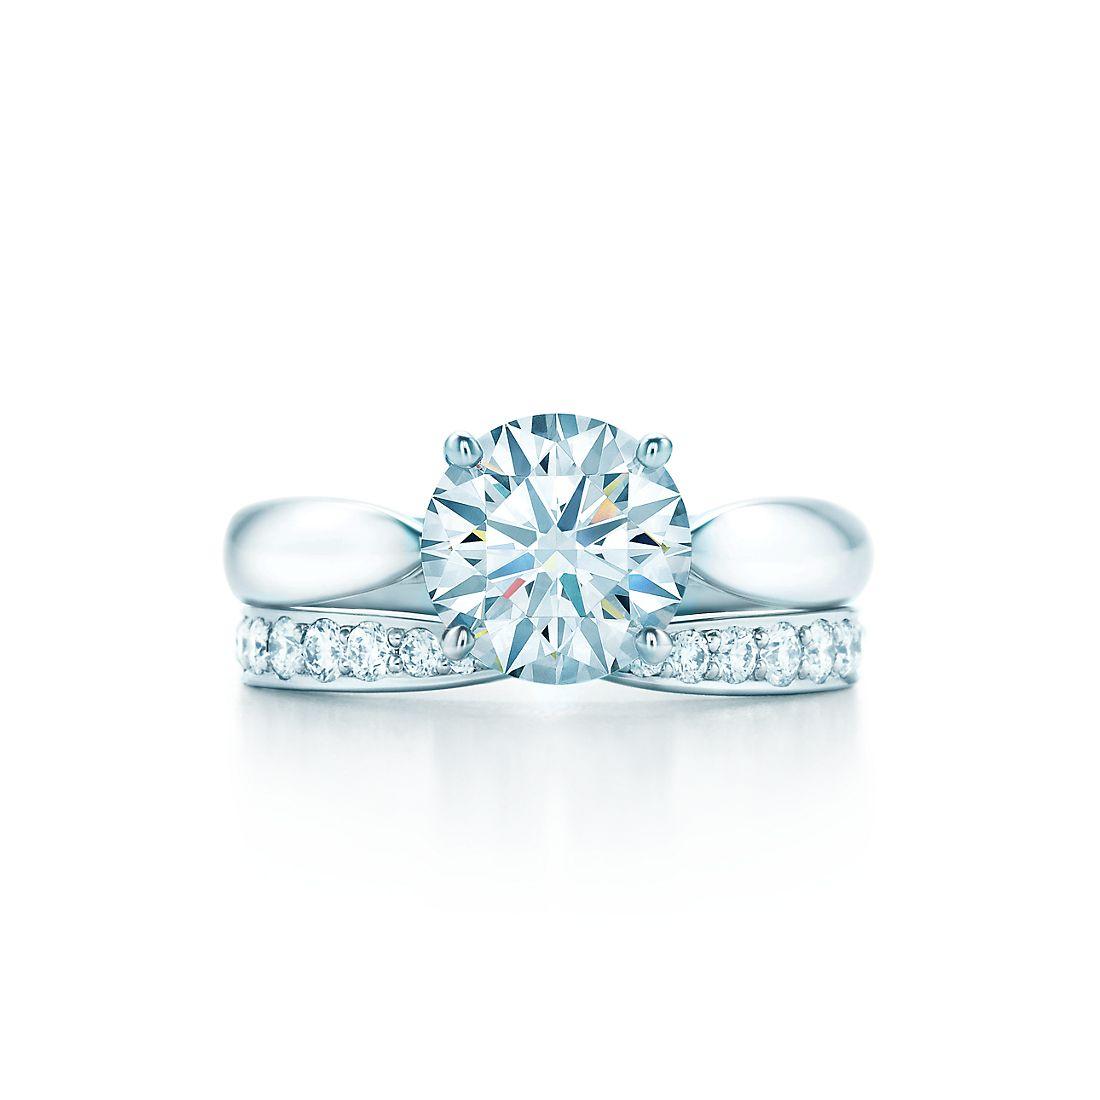 149 ct shown with tiffany harmony band ring - Tiffany Wedding Ring